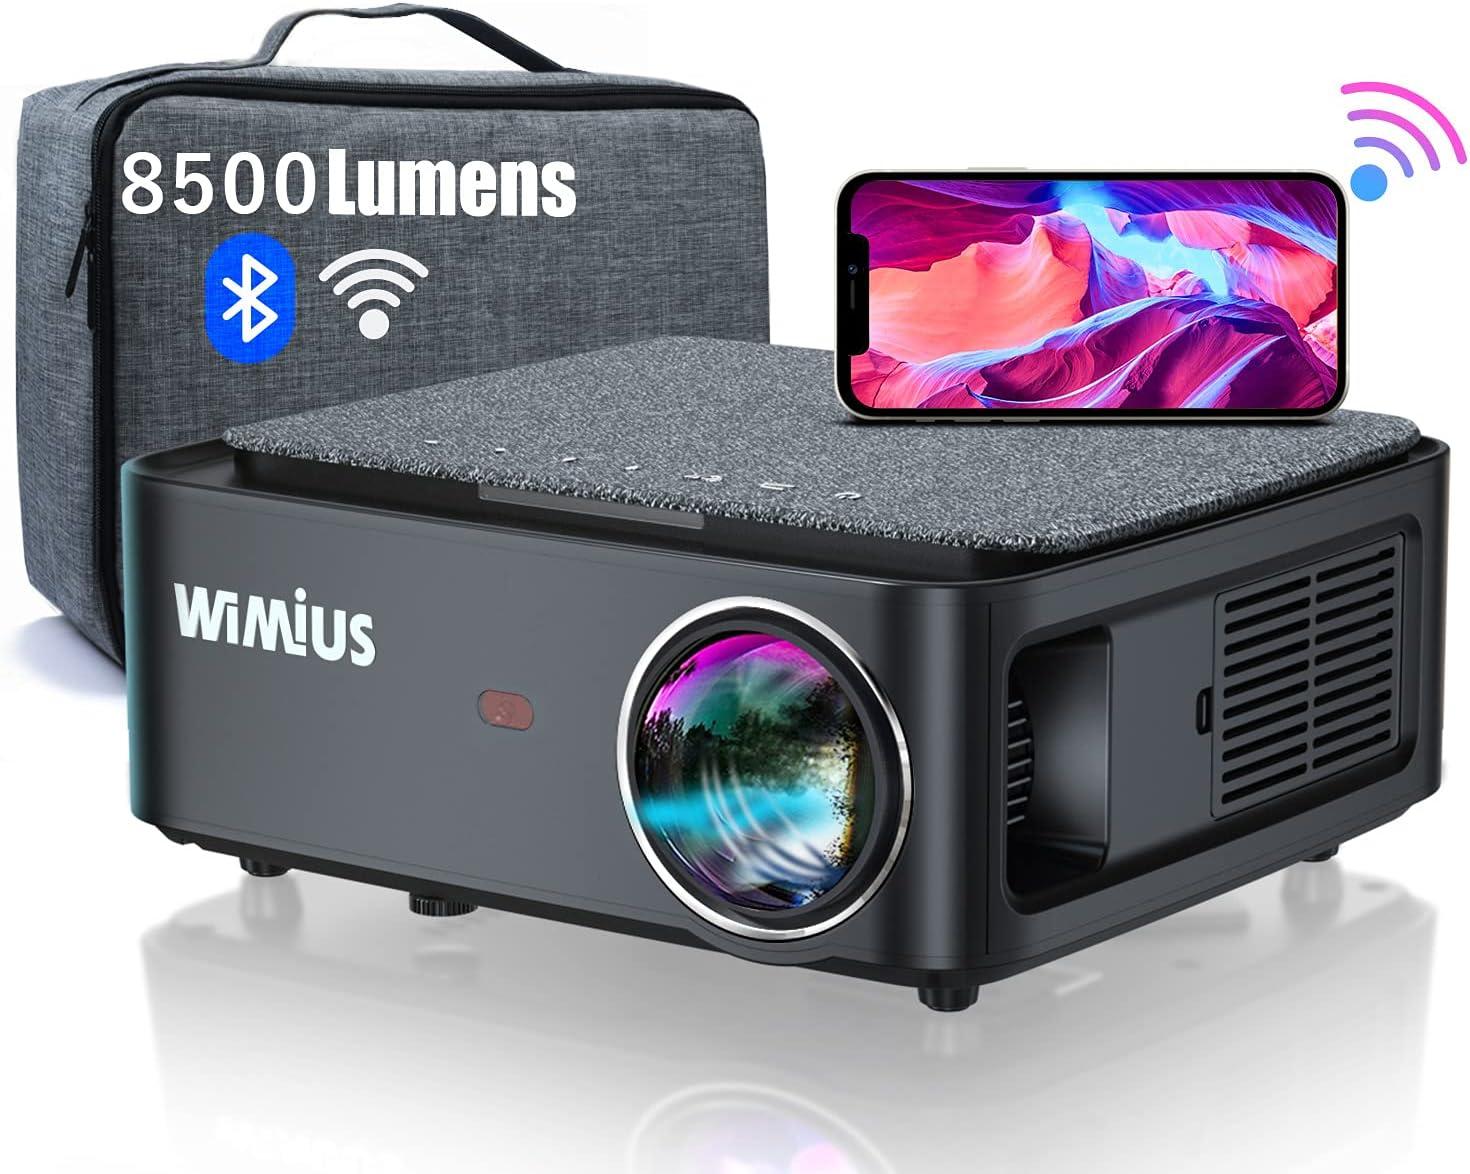 WiMiUS プロジェクター 8500lm WiFi 5G